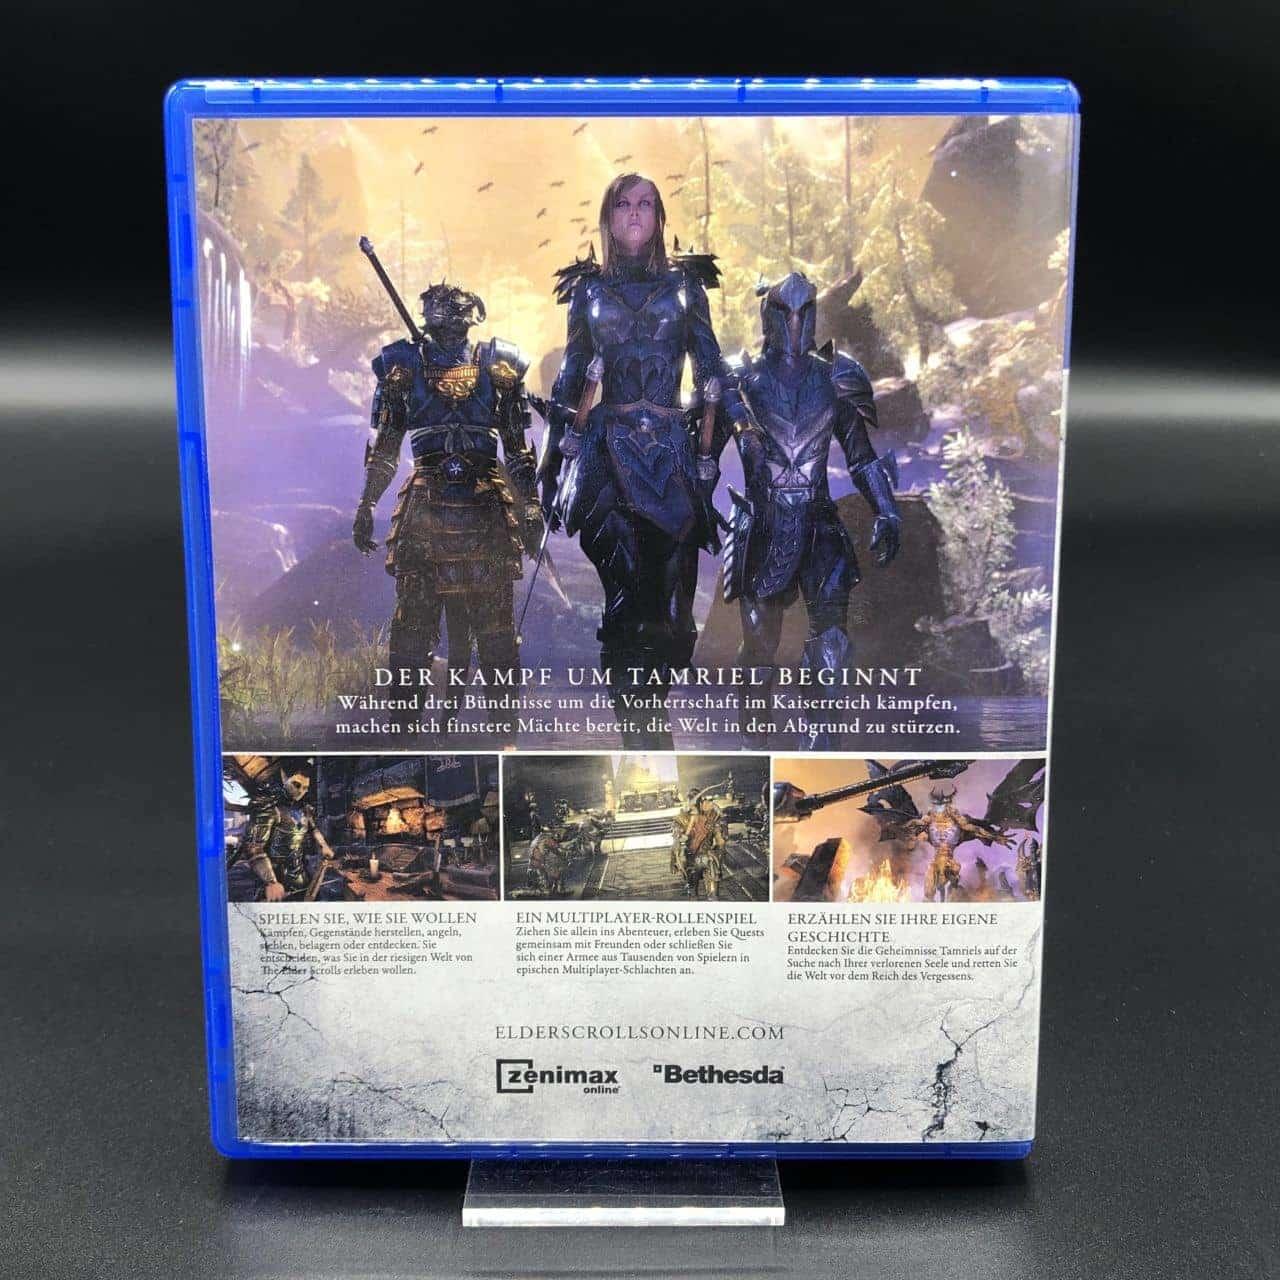 PS4 The Elder Scrolls Online: Tamriel Unlimited (Sehr gut) Sony PlayStation 4